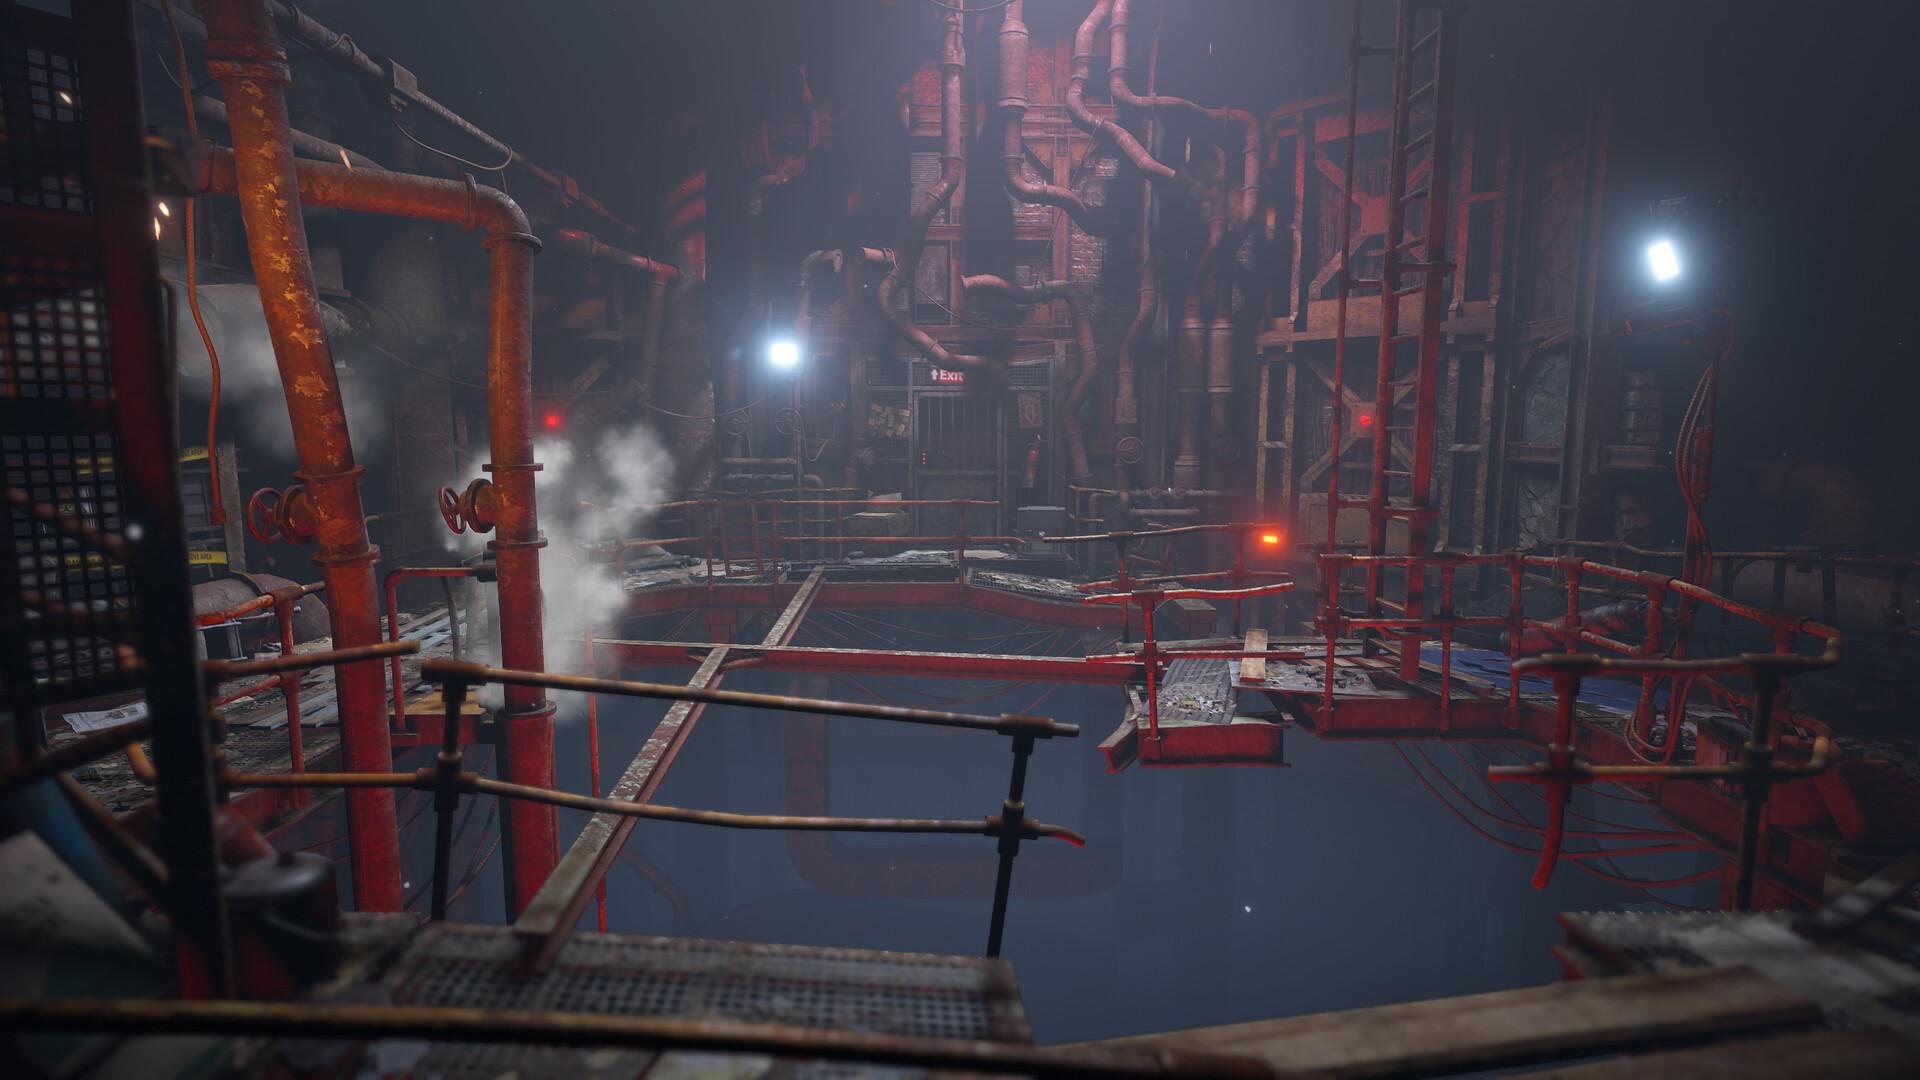 Andrew averkin utopiasyndrome boiler a2 13